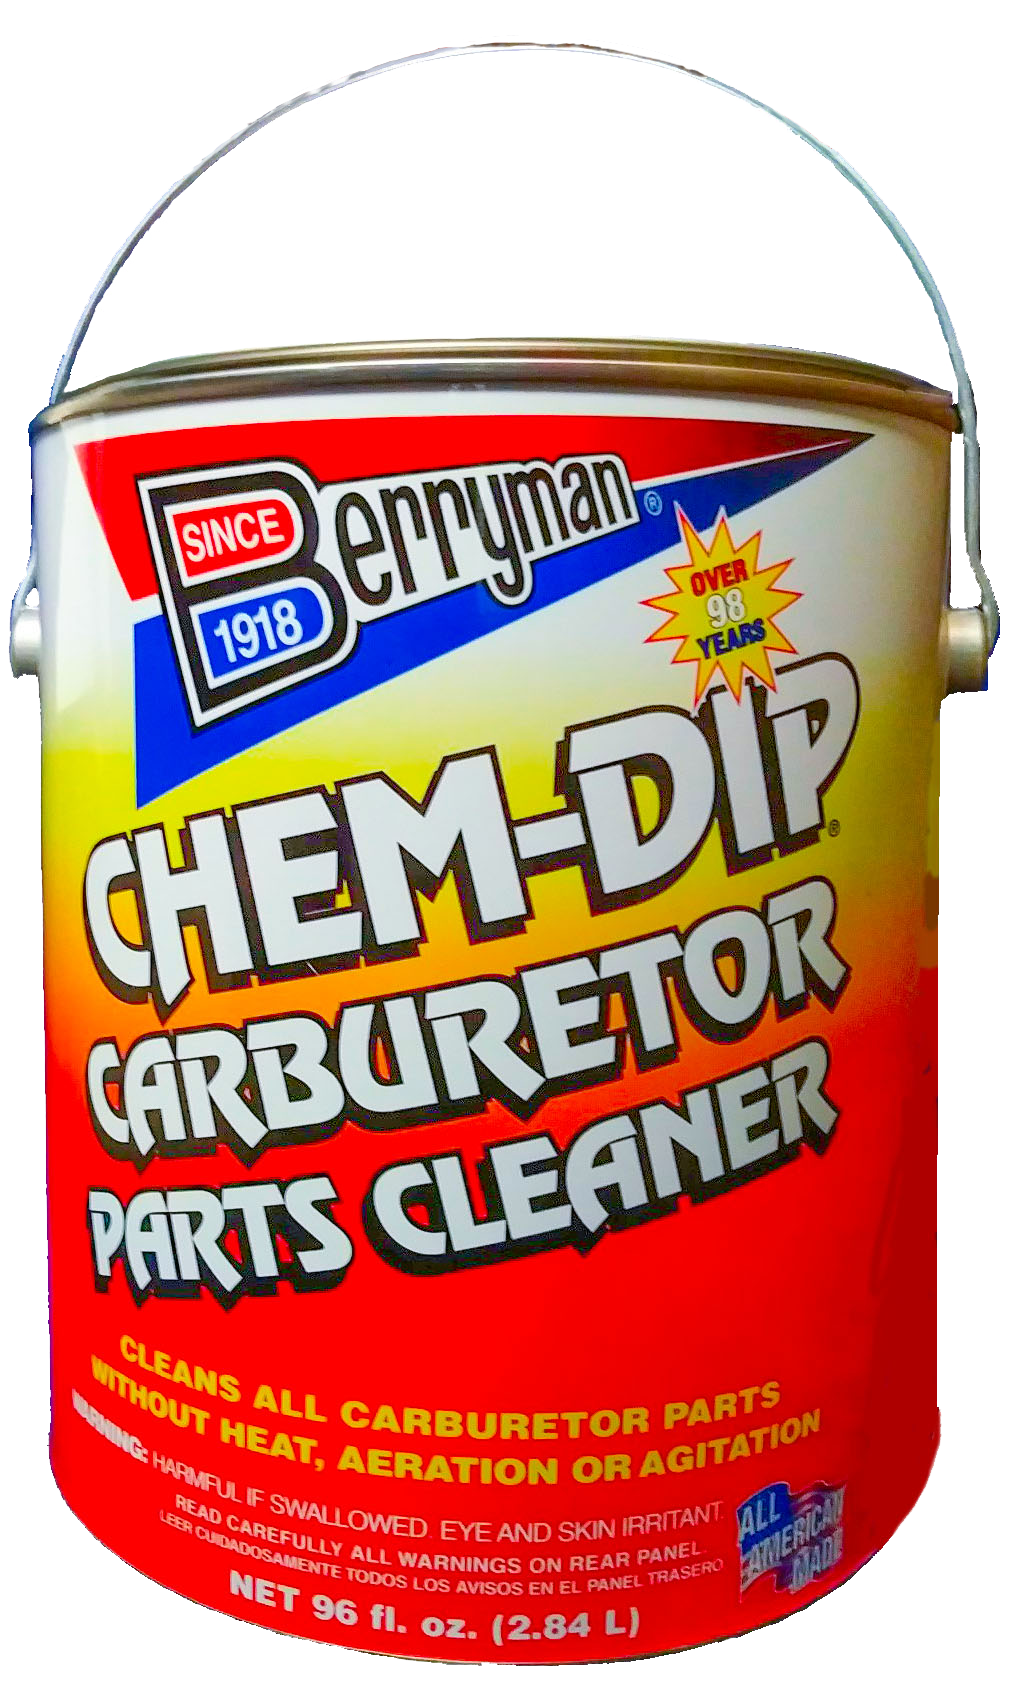 Berryman® Chem-Dip® Carburetor Parts Cleaner | Berryman Products